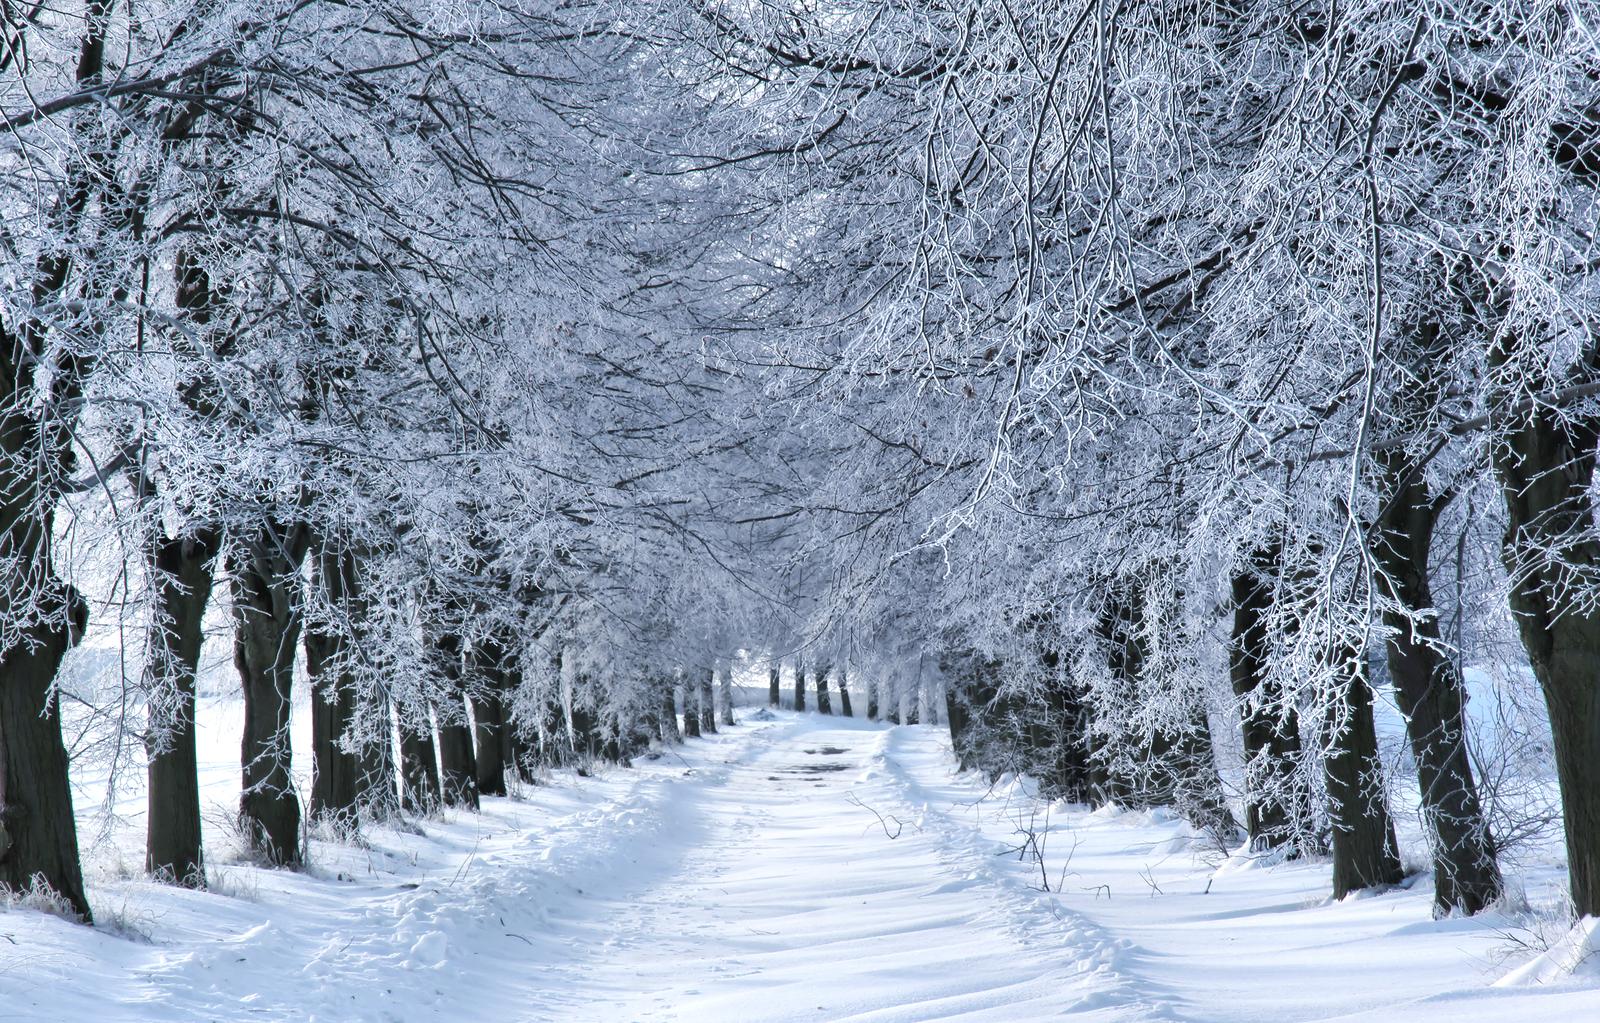 Hyde Park Winter Wonderland - Official Site